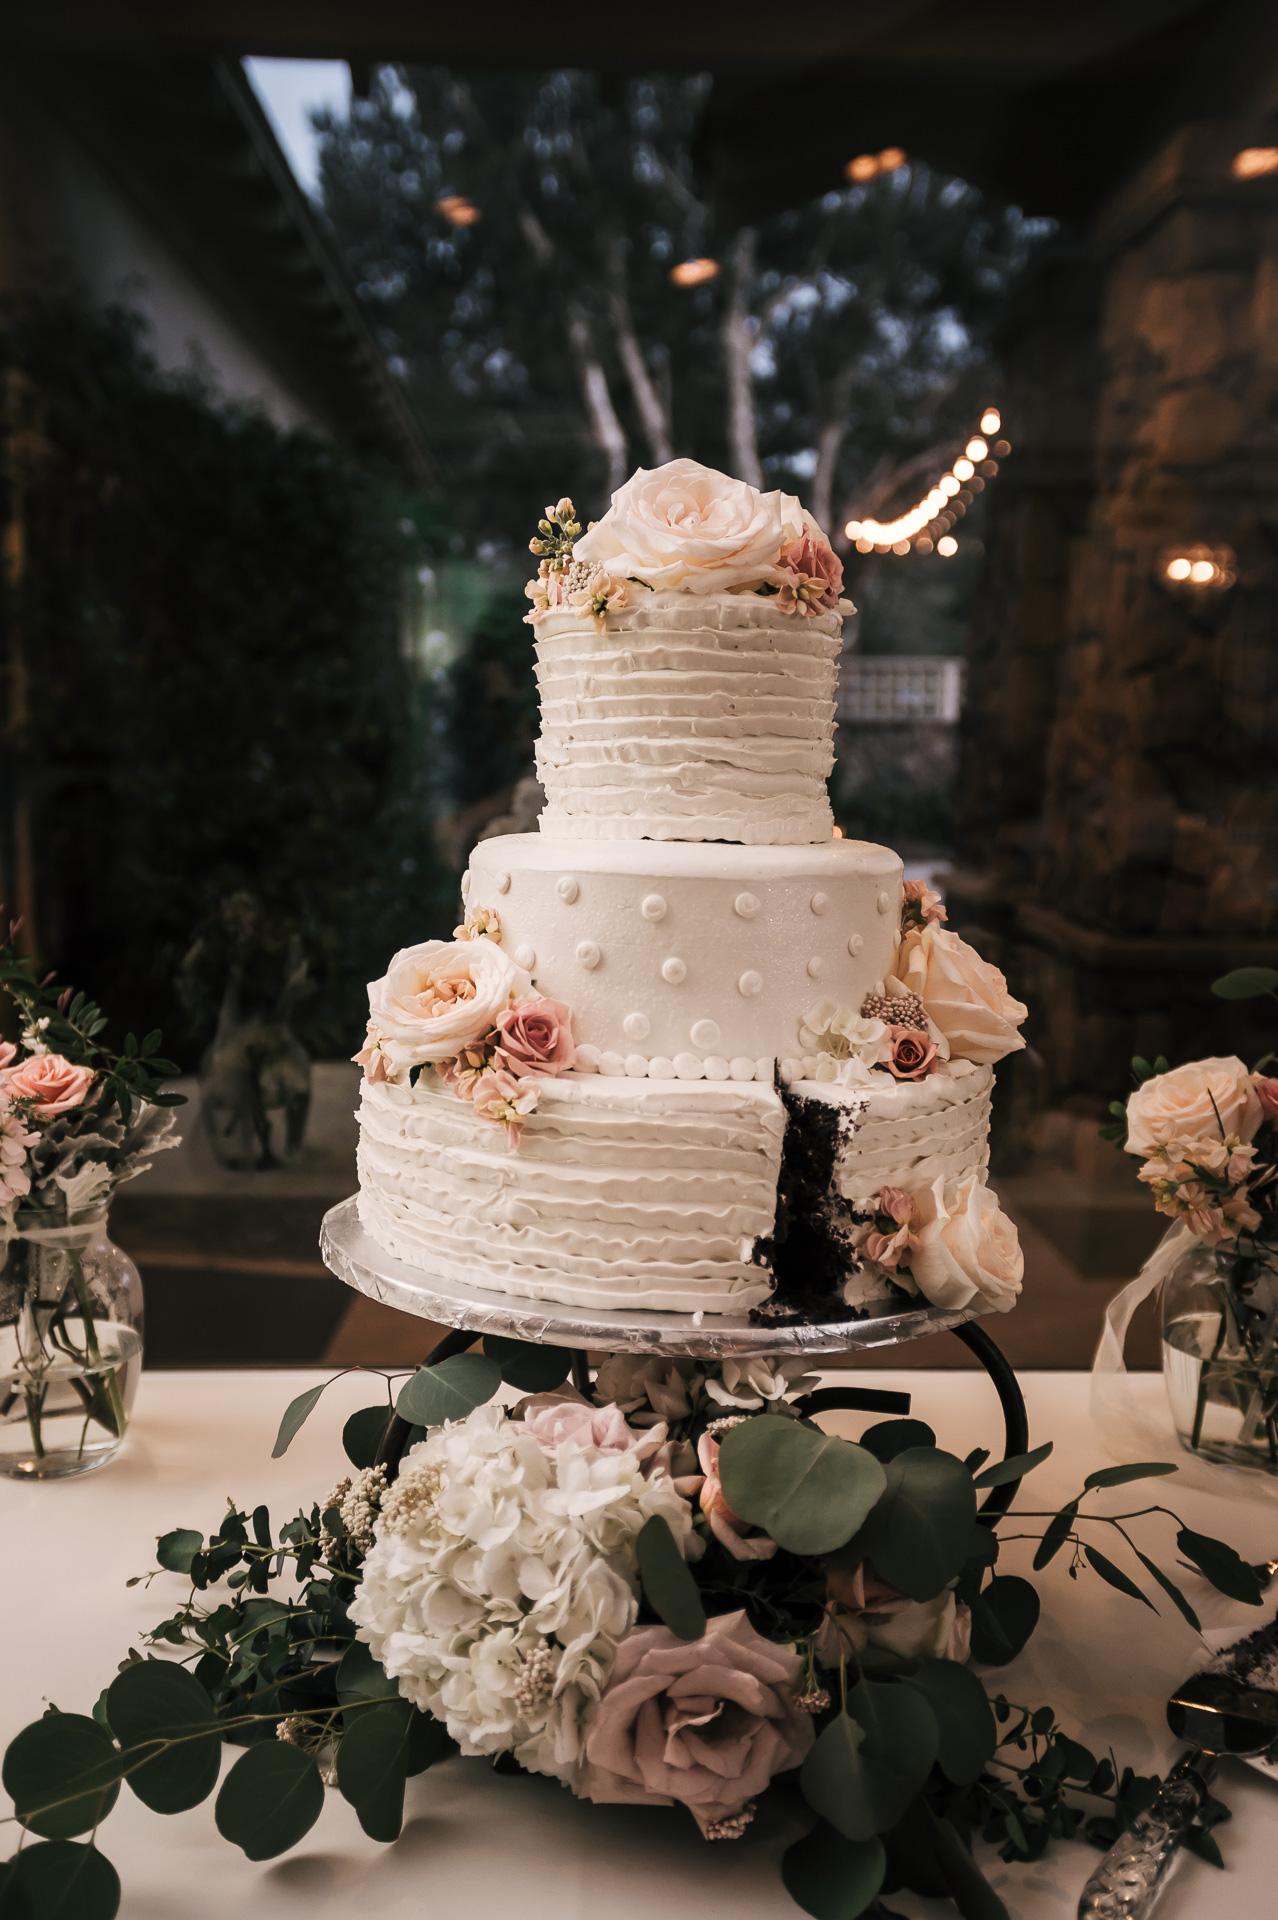 beautiful wedding cake after caek cutting at the Twin Oaks Golf Course in San Marcos, San Diegos premier wedding venue